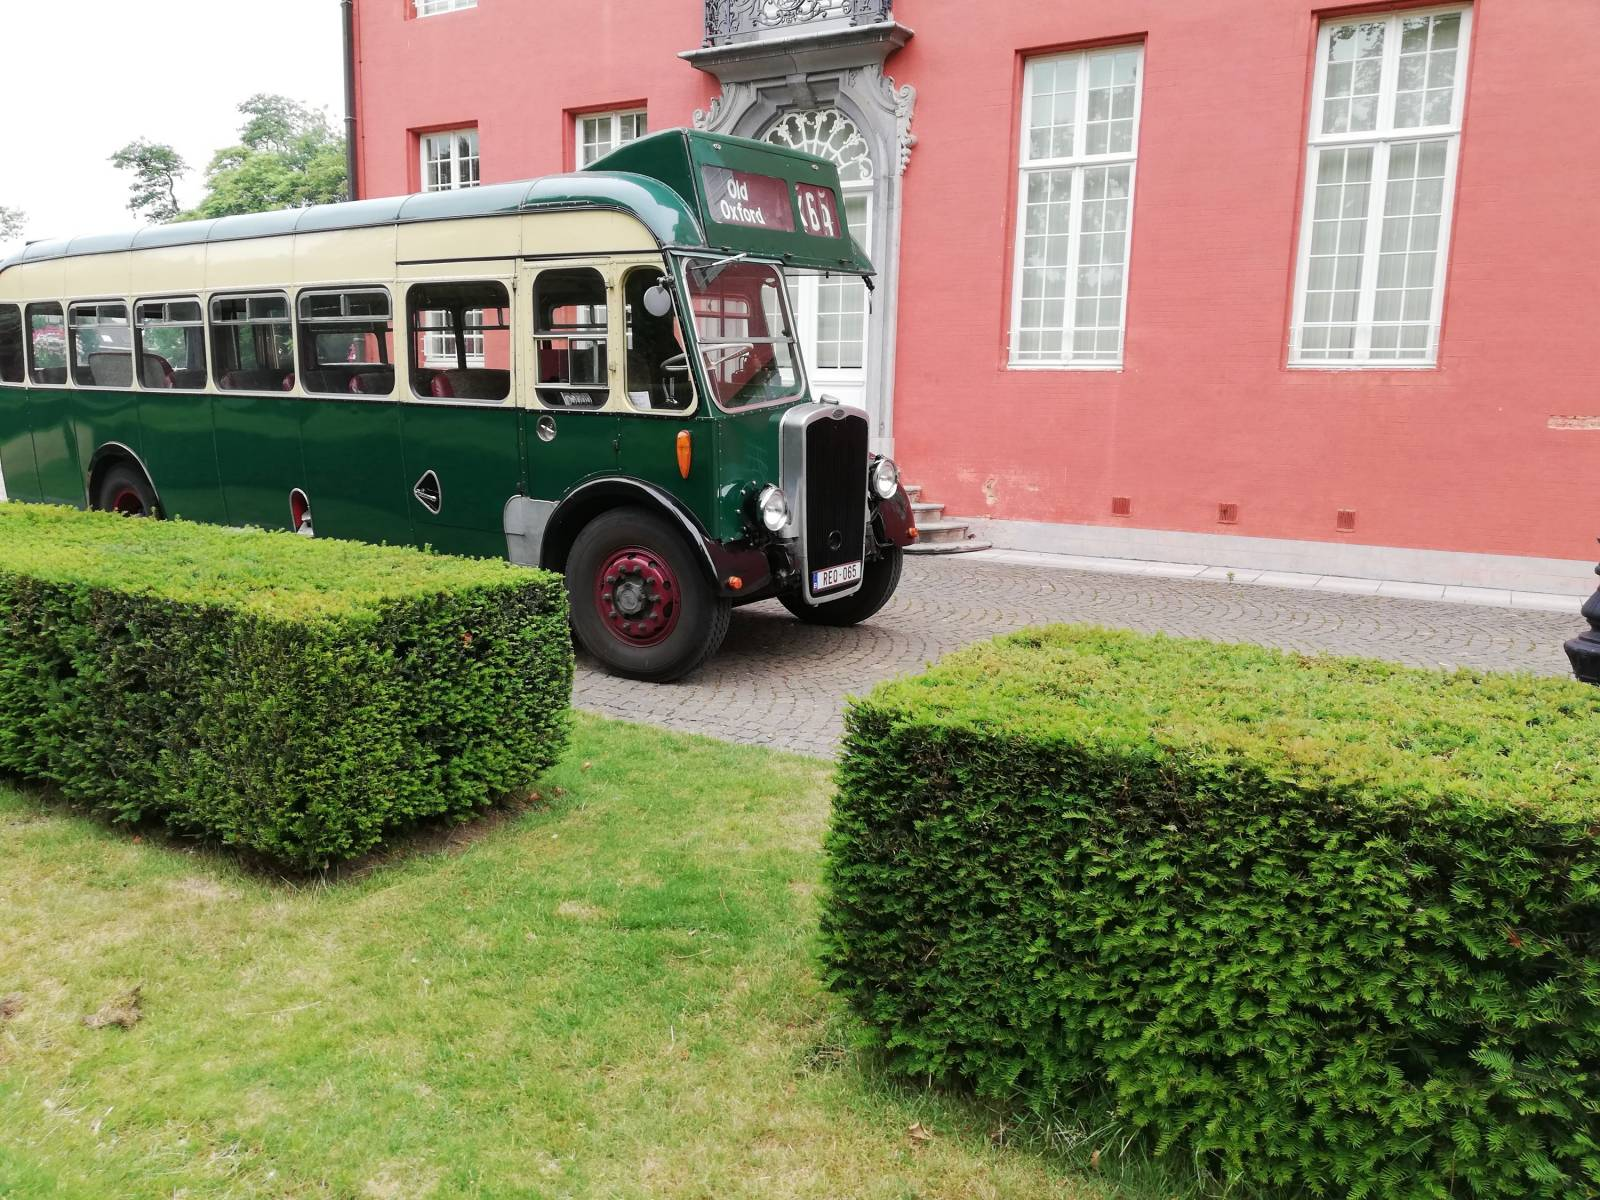 The London Ceremony Bus - Trouwvervoer - Ceremonievervoer - Bus - House of Weddings - 24